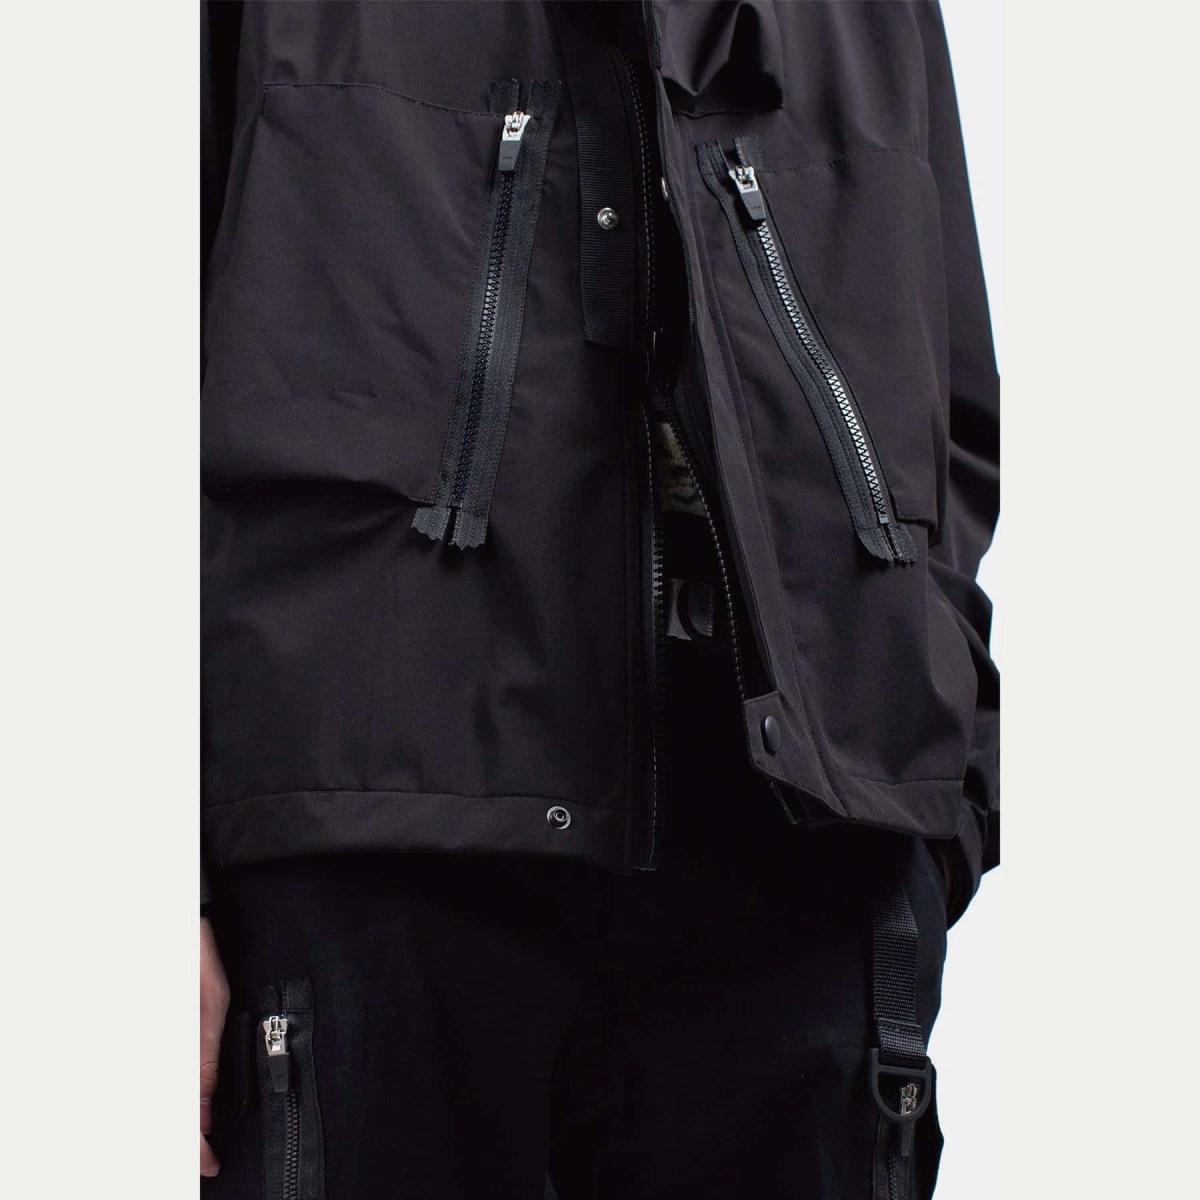 Techwear-Kin-Supplies-Ares-Shell-Jacket-Details-10.jpg